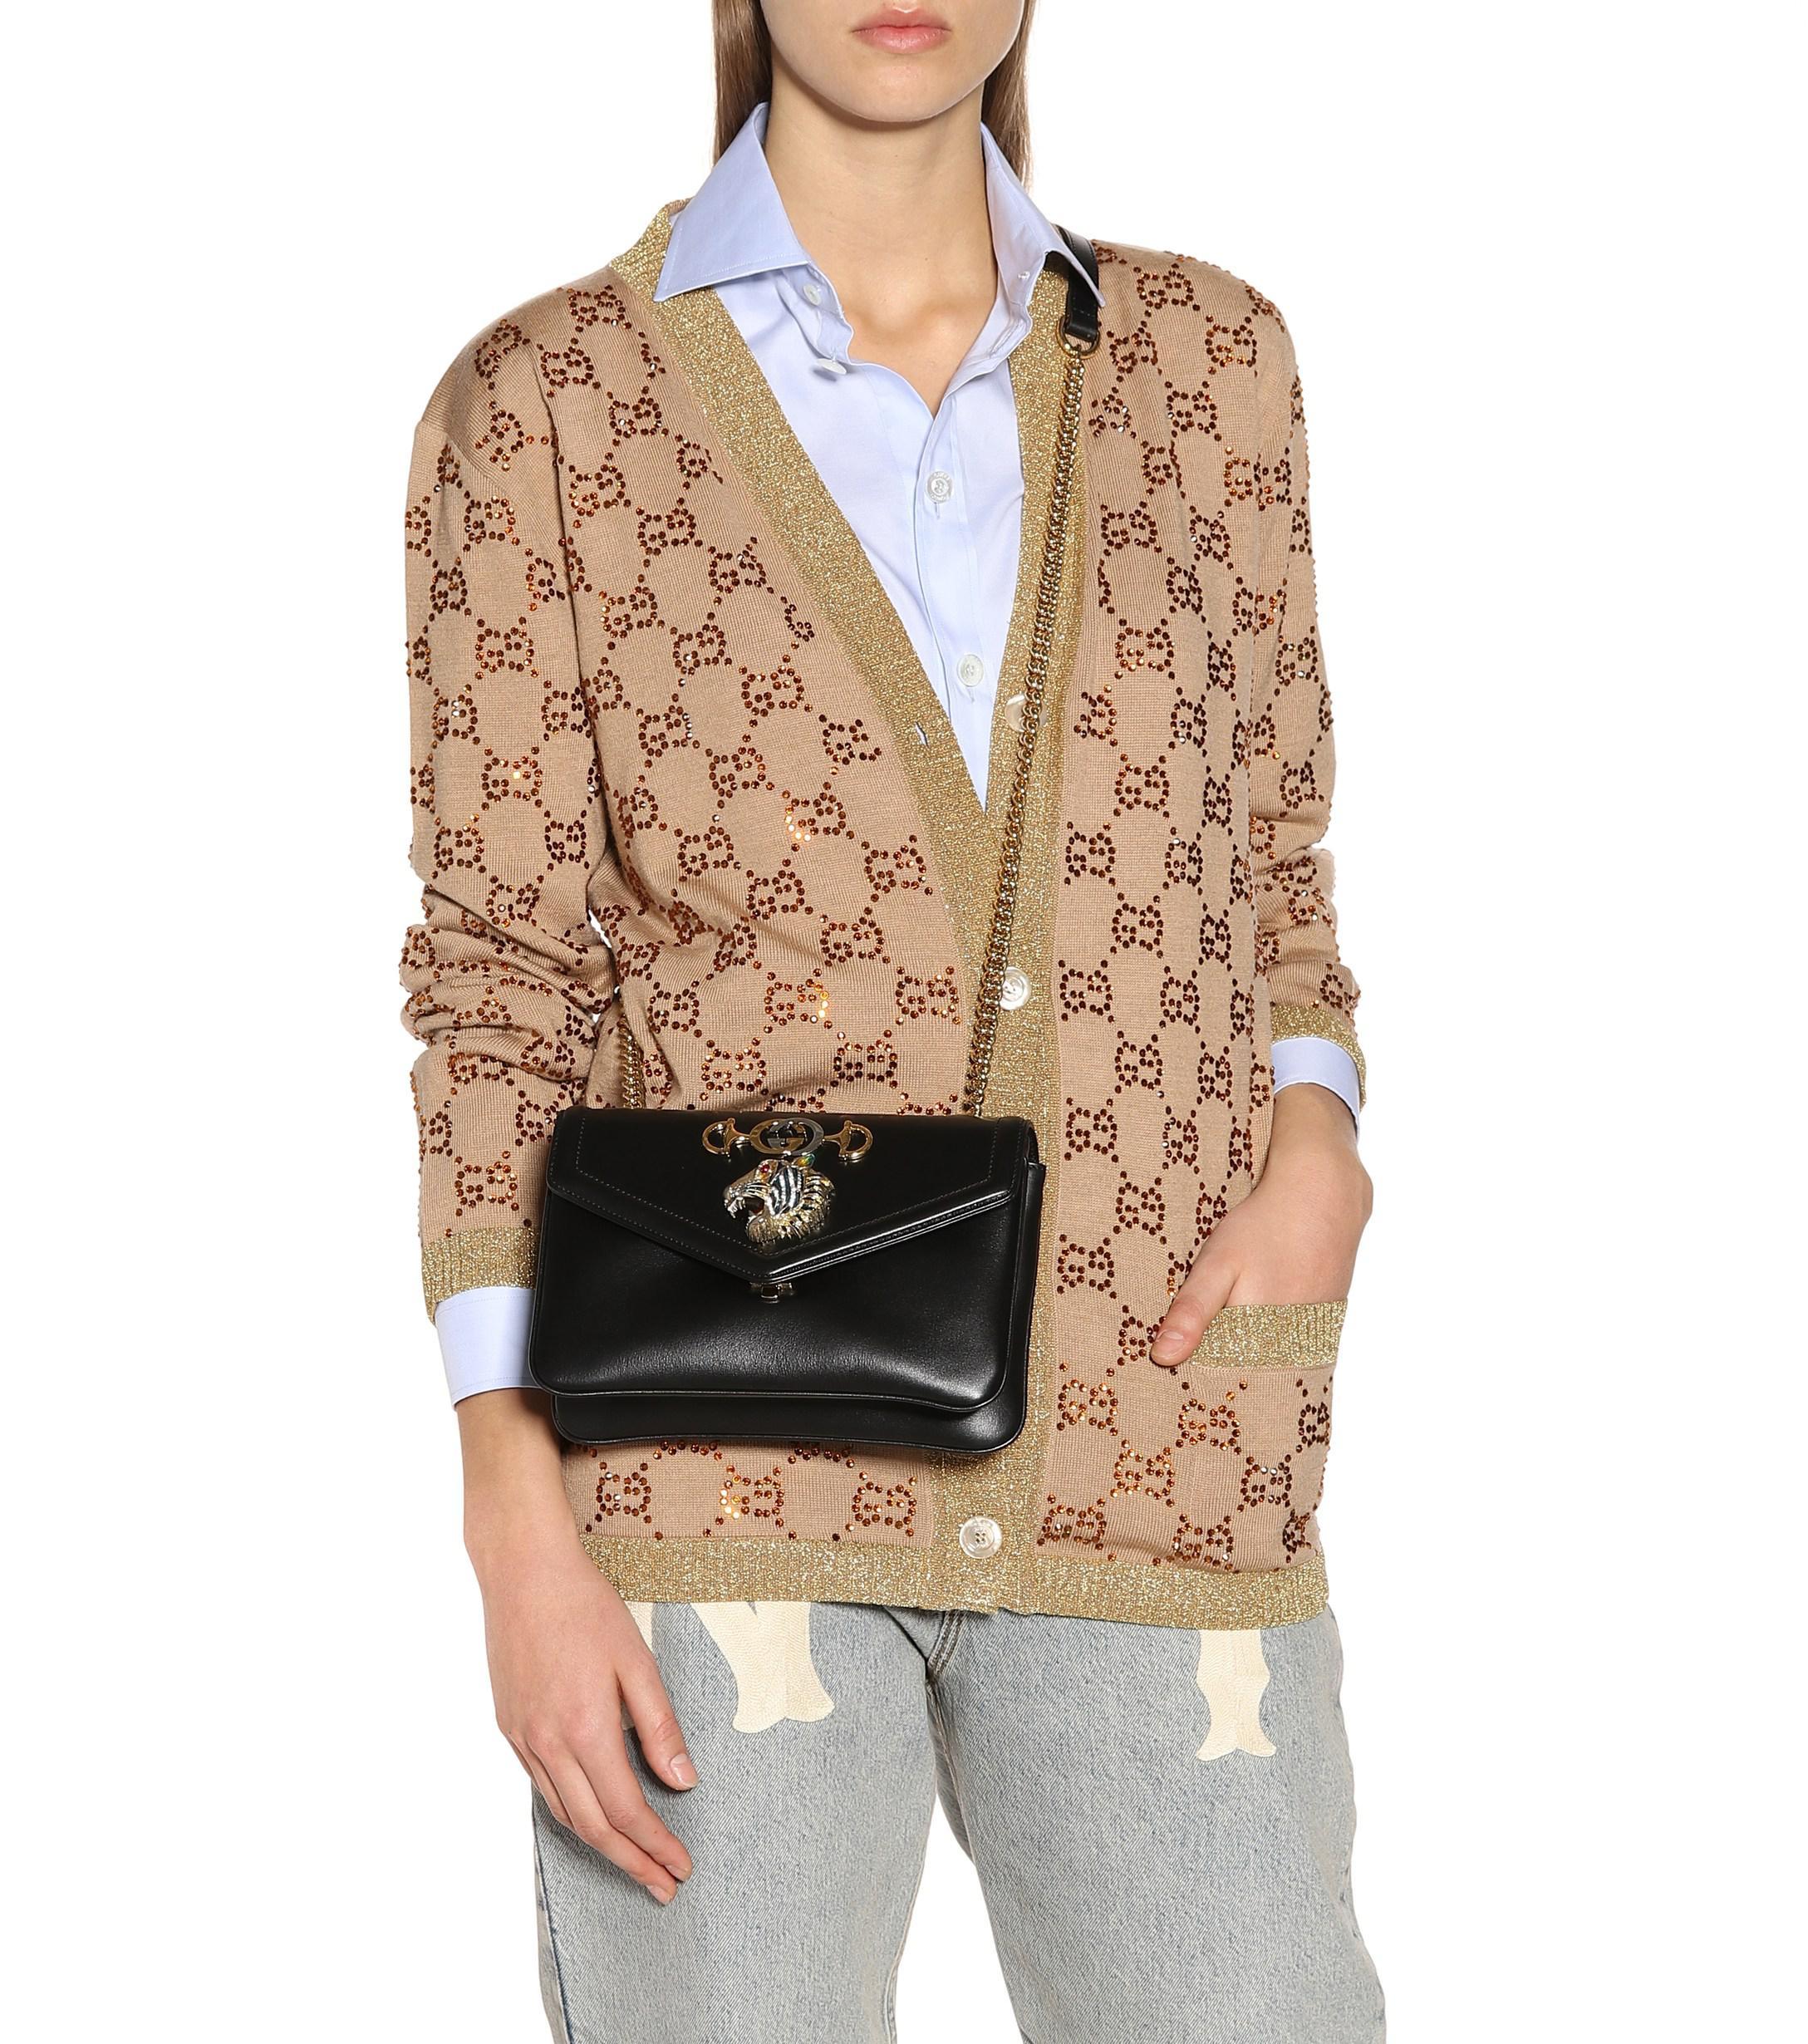 8ffe9975b87c05 Gucci Rajah Small Leather Shoulder Bag in Black - Lyst